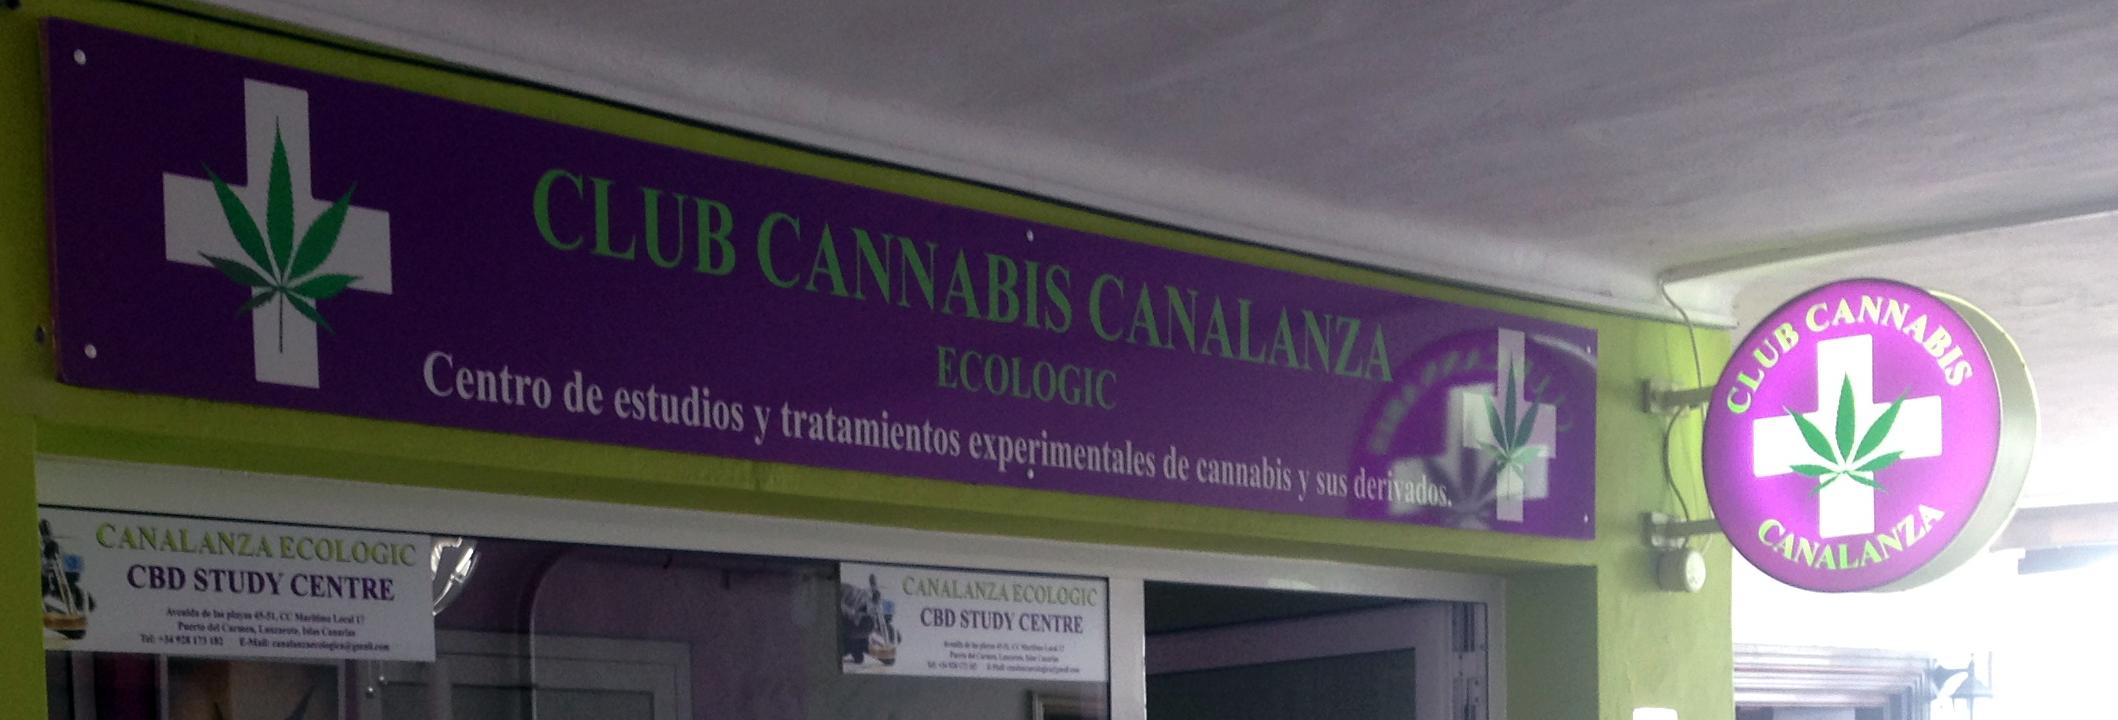 cabecera canalanza